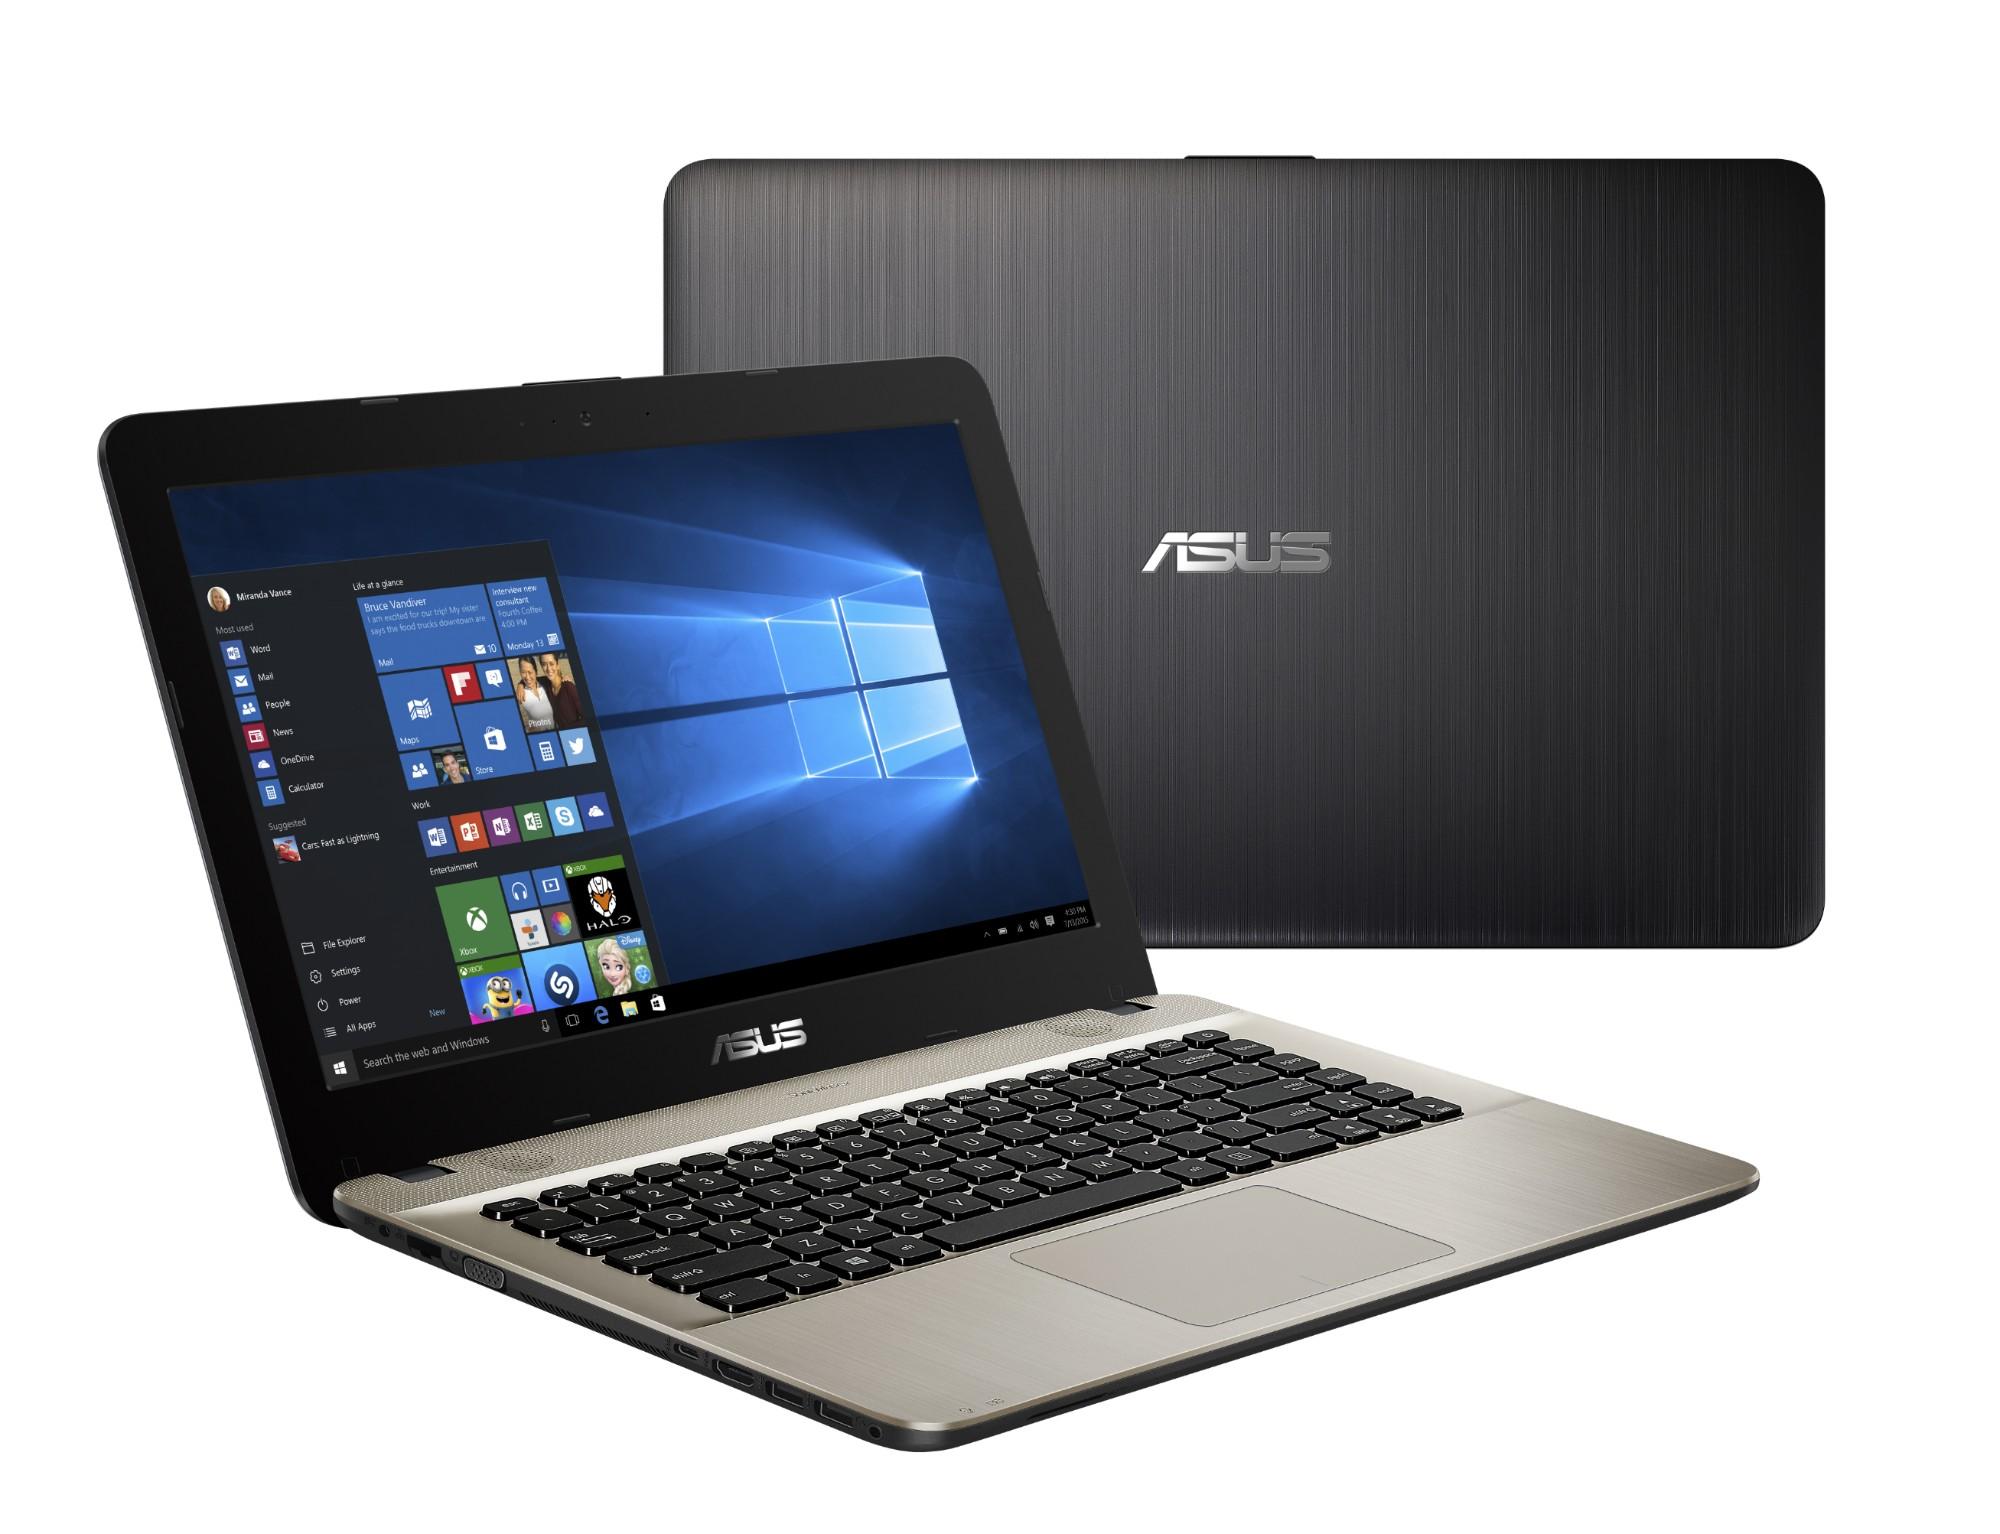 Laptop Desain Grafis 2 Jutaan ASUS VivoBook Max X441UV